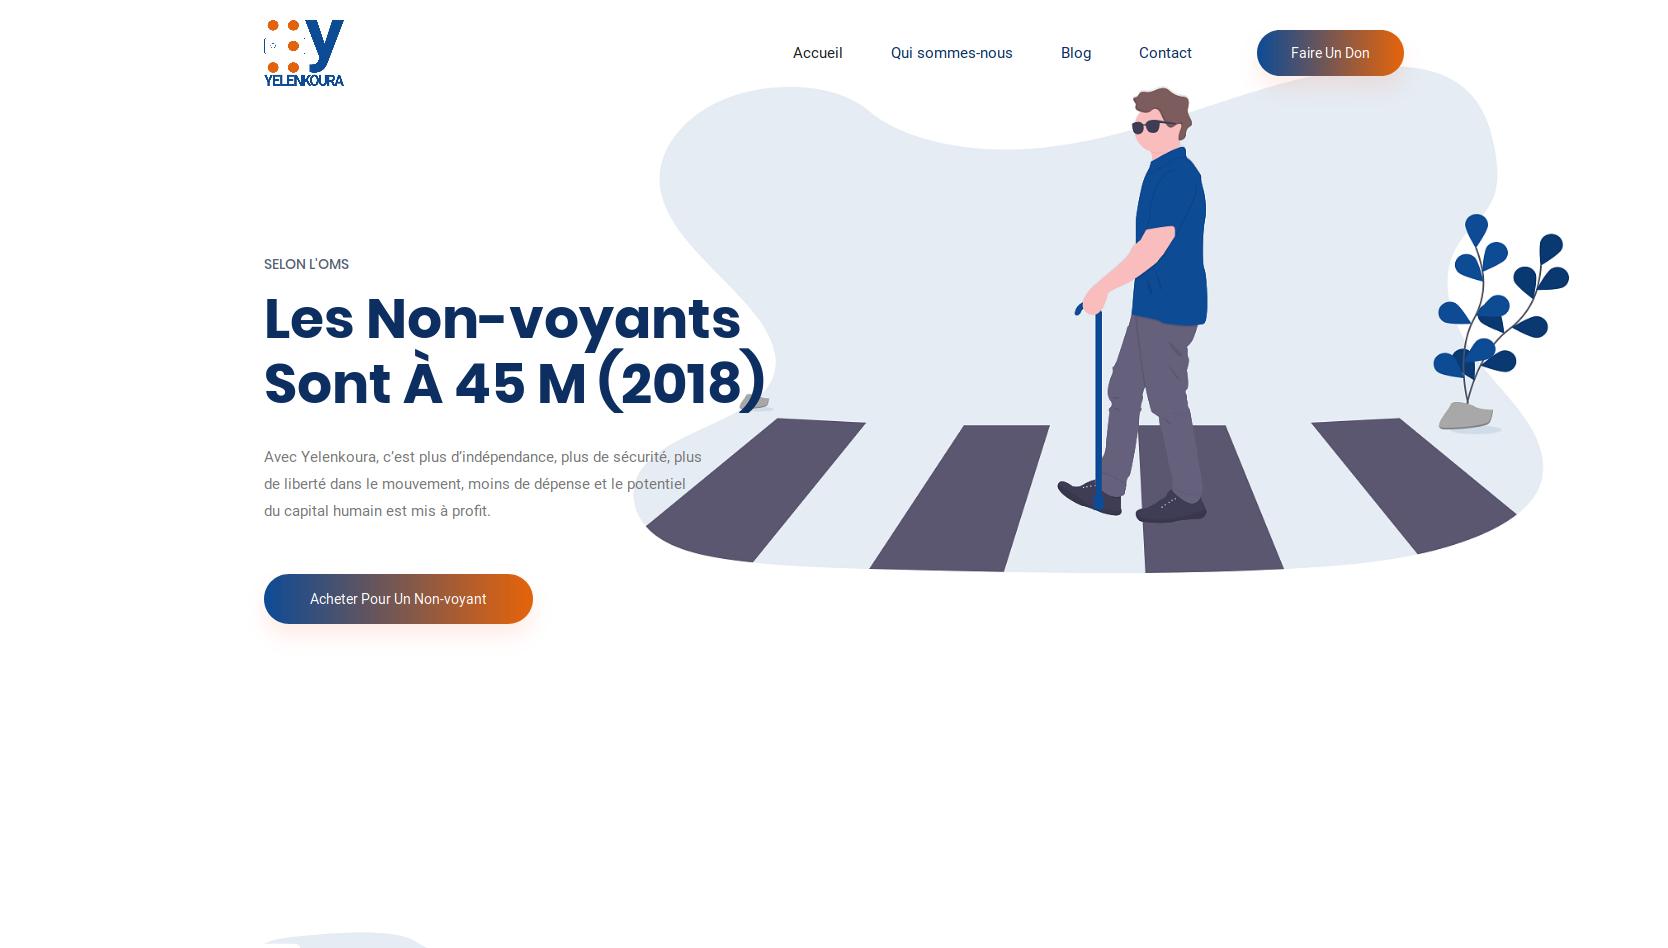 Yelenkoura's website